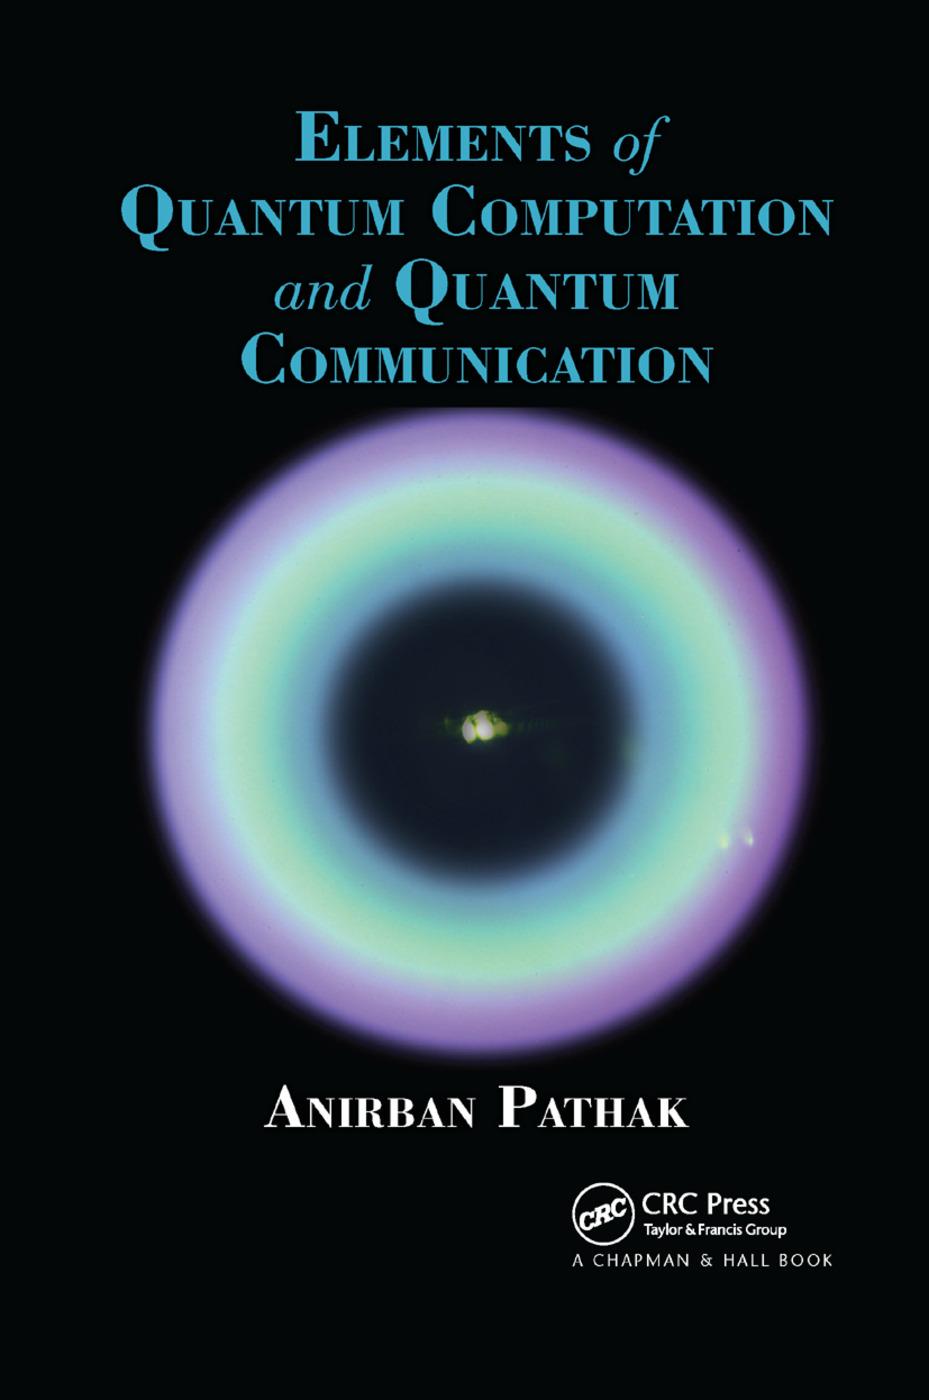 Elements of Quantum Computation and Quantum Communication: 1st Edition (Paperback) book cover